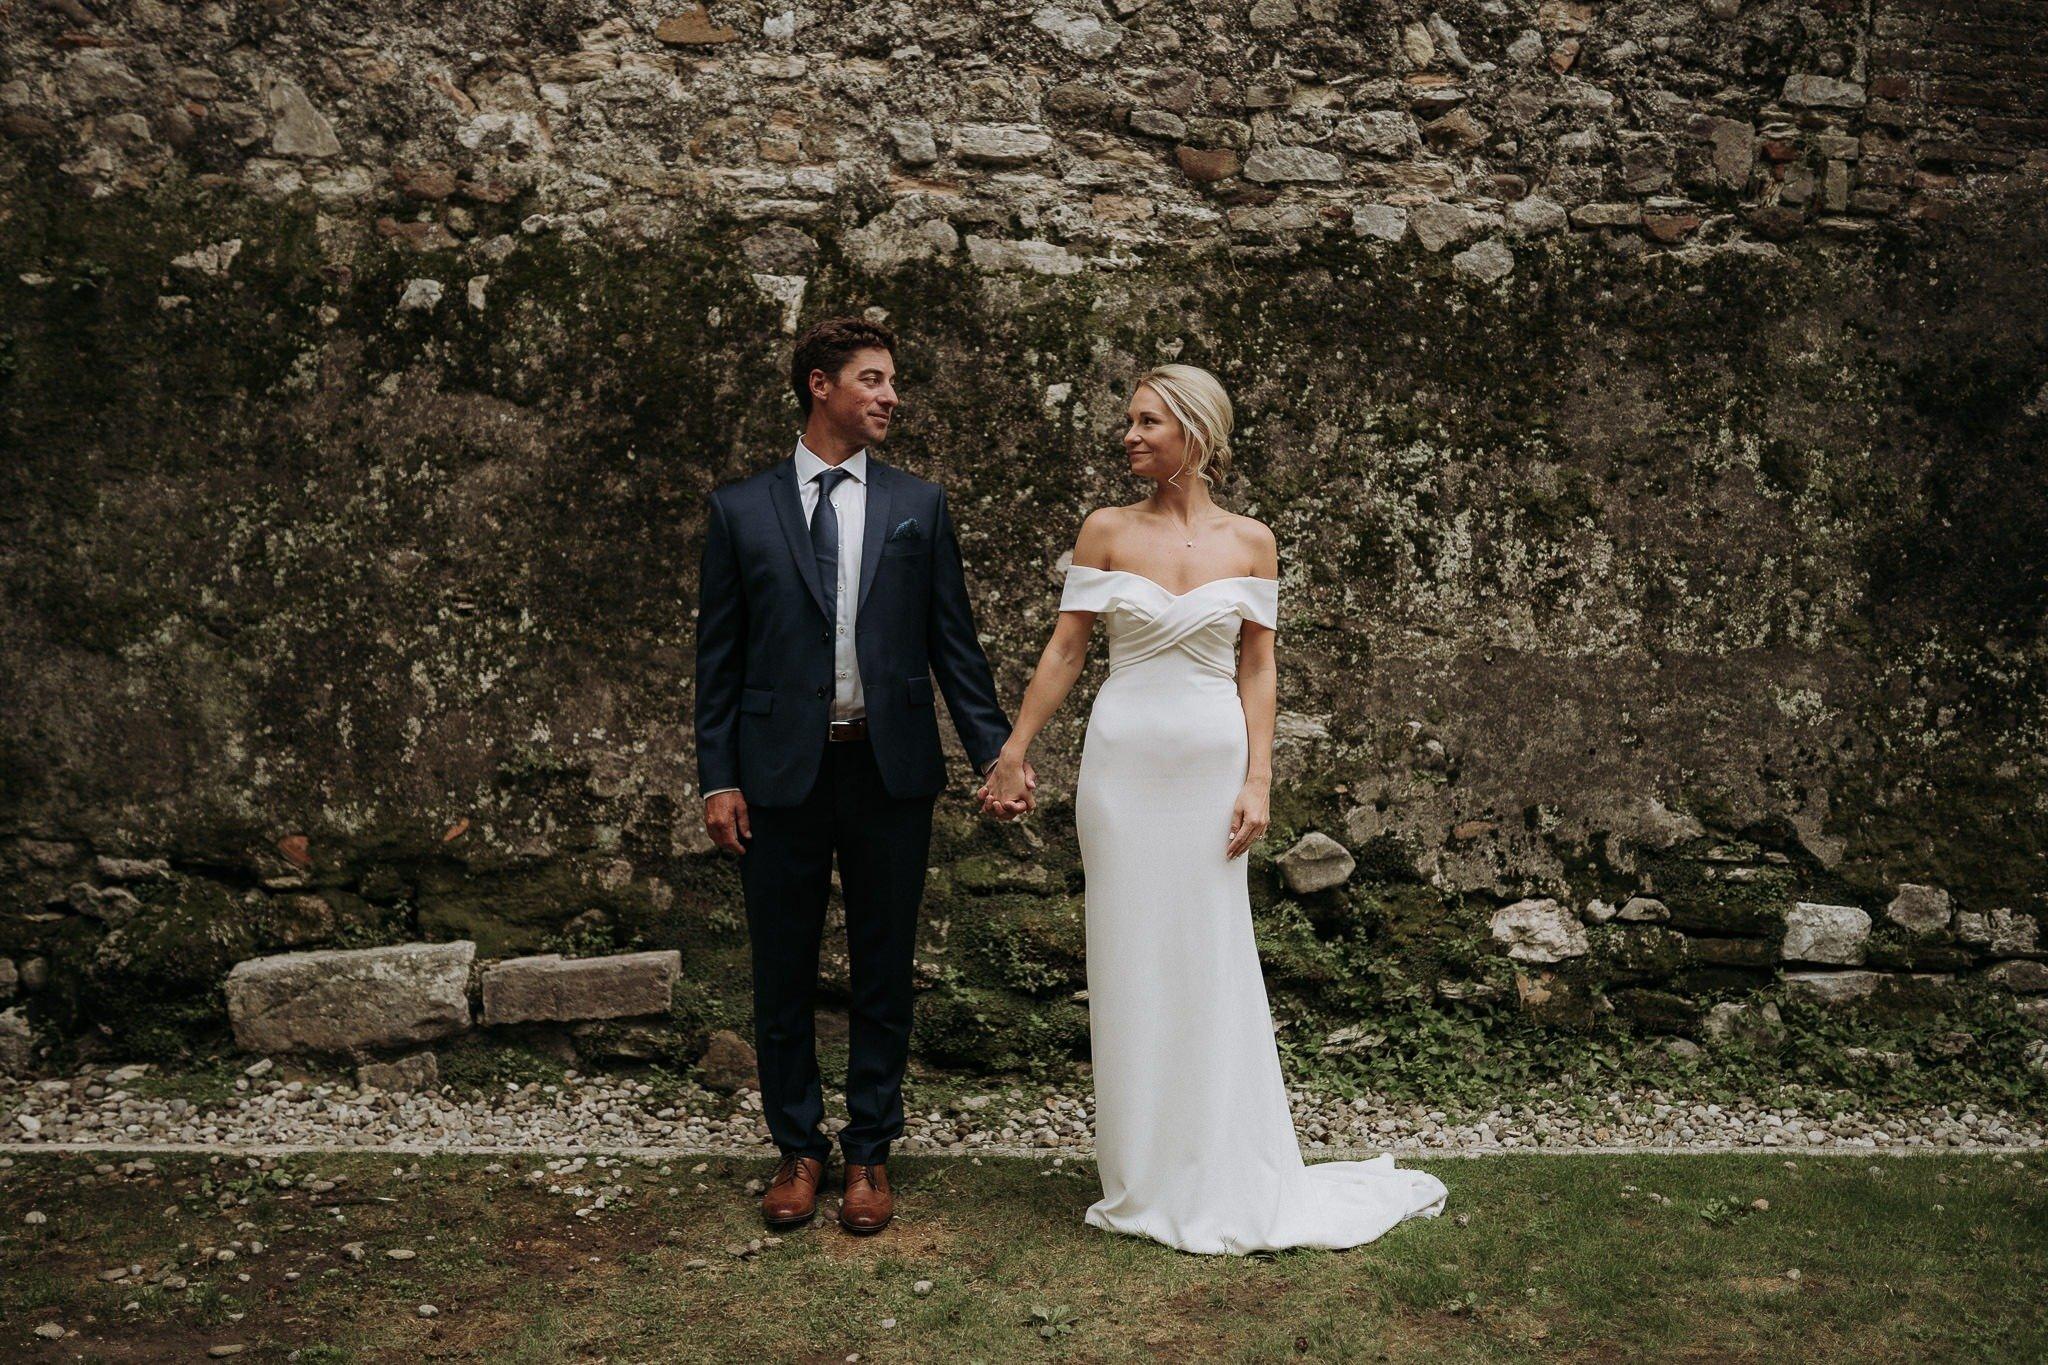 Catie & Trav's Lake Garda wedding – Sant'Anna Church & Villa Arcadio